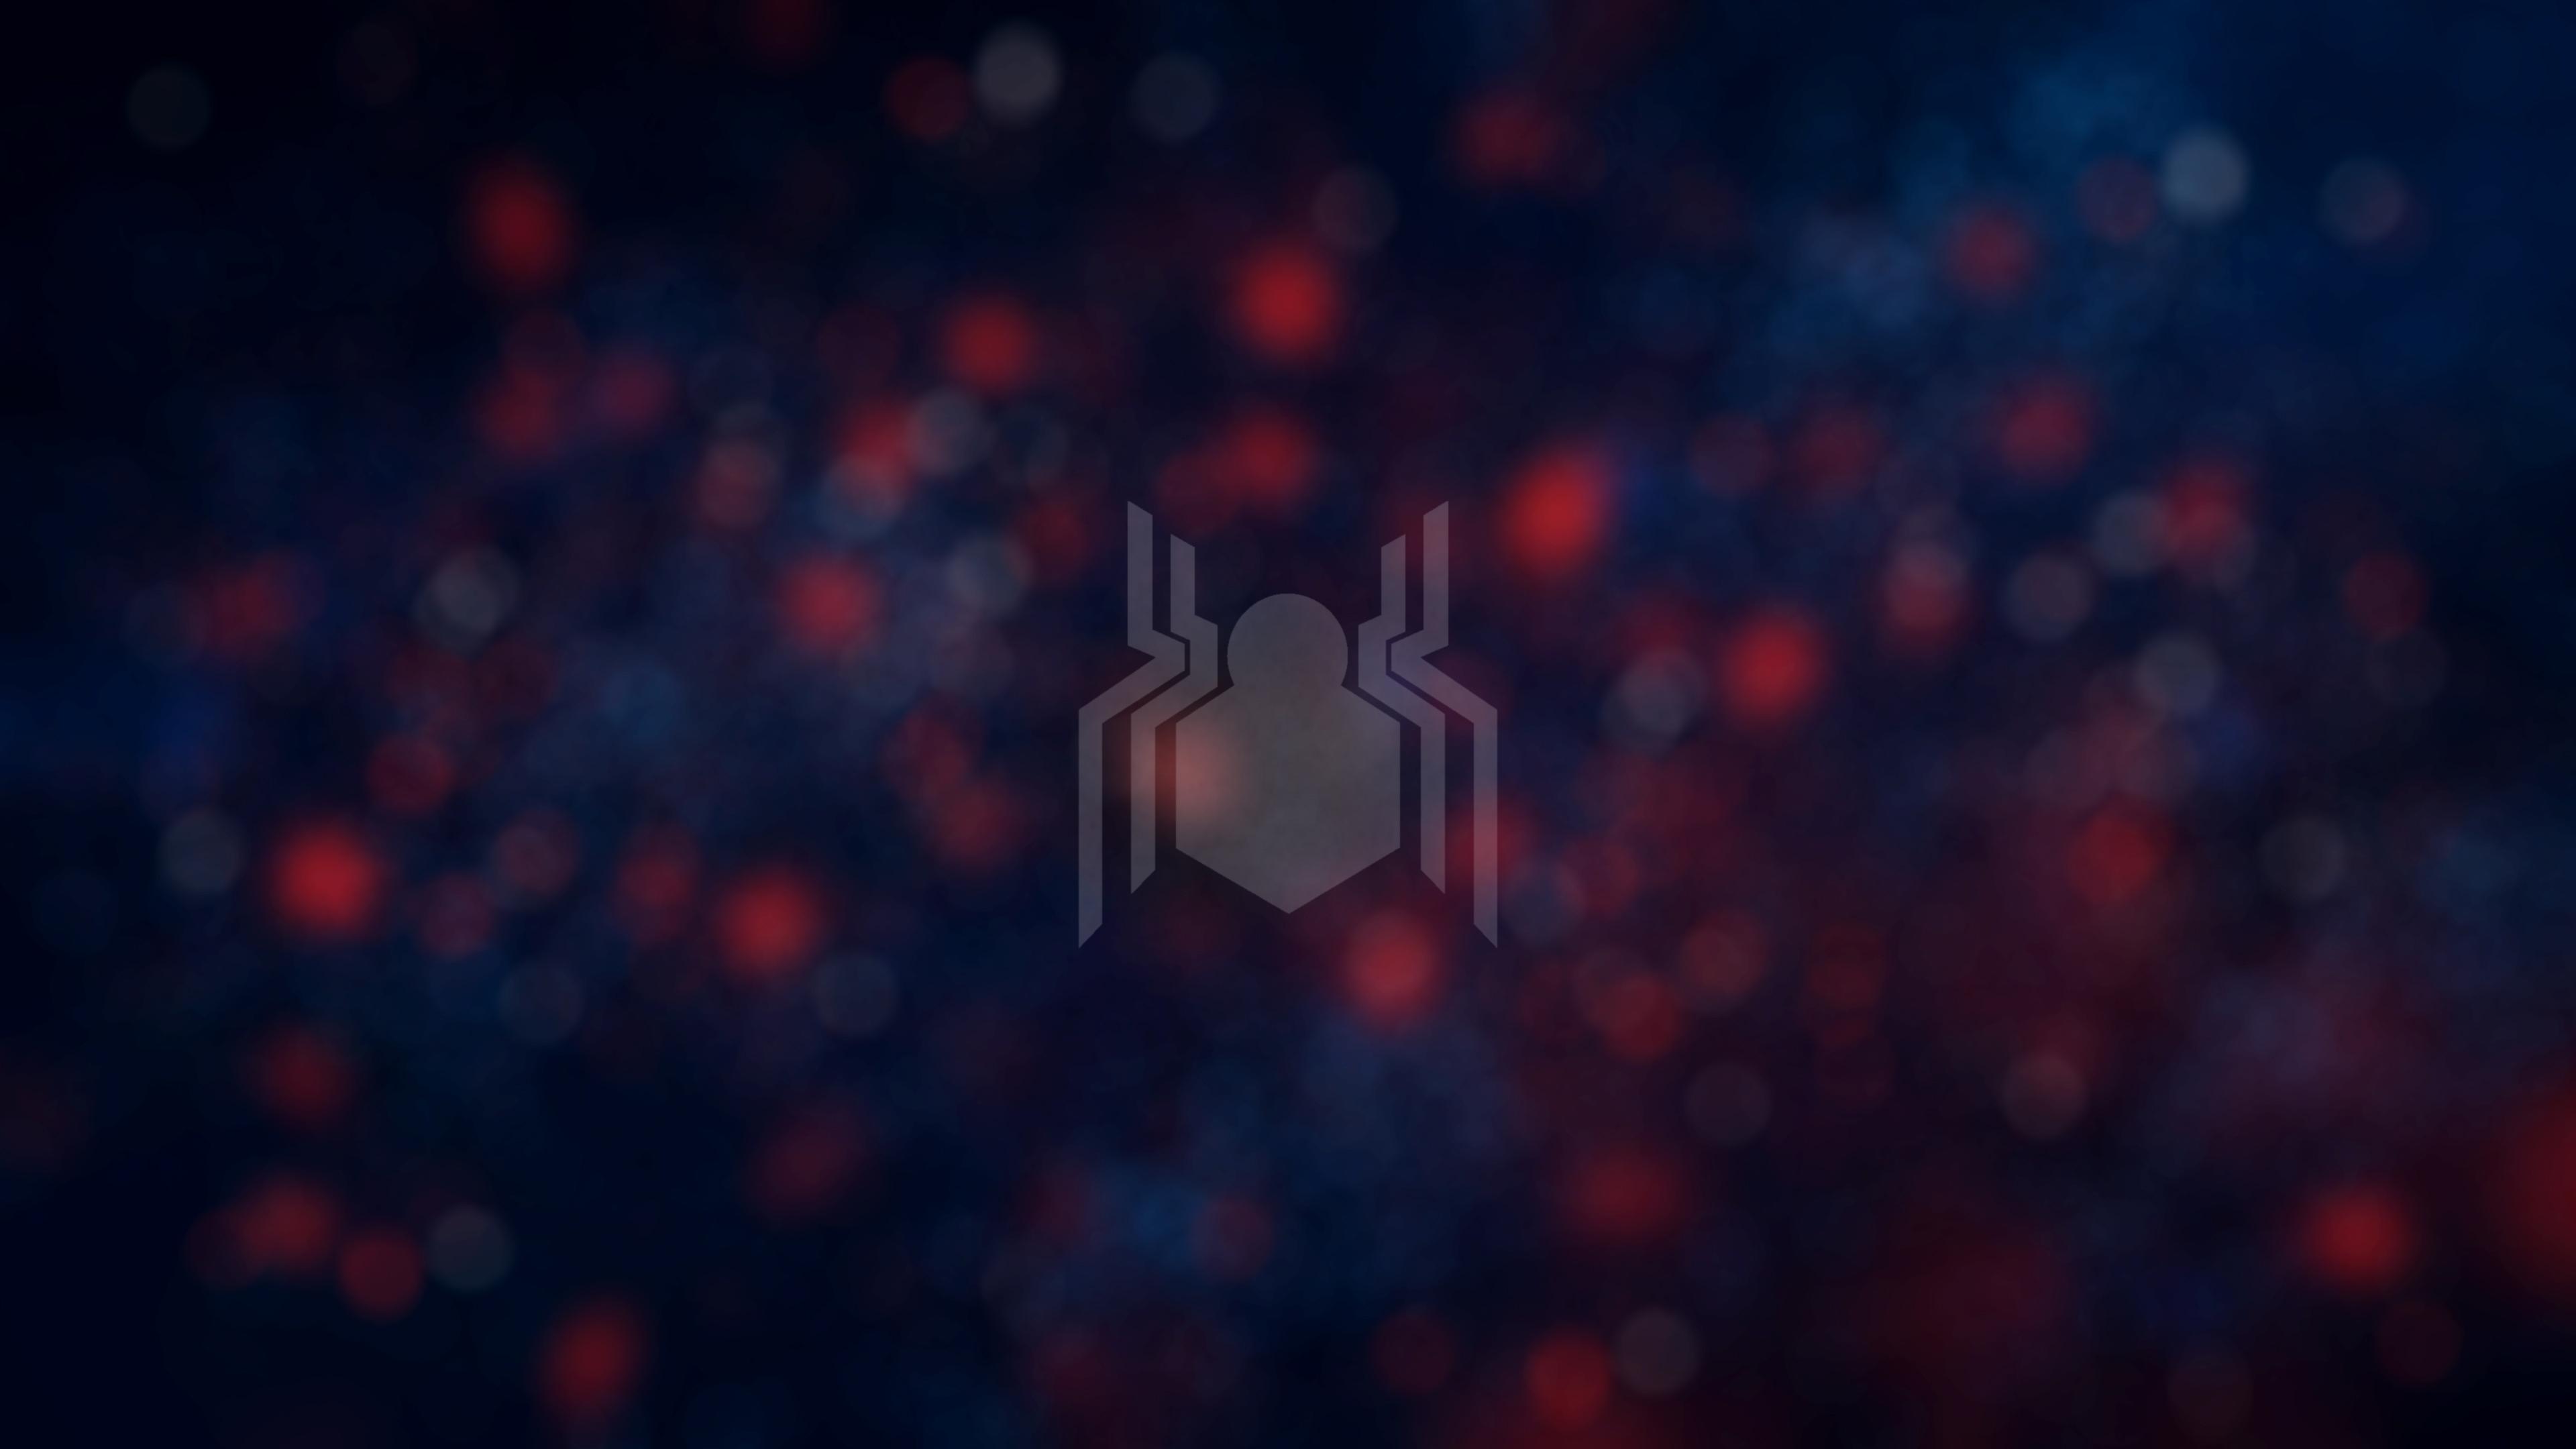 Spider Man Homecoming 4K wallpaper blurry   Imgur 3840x2160